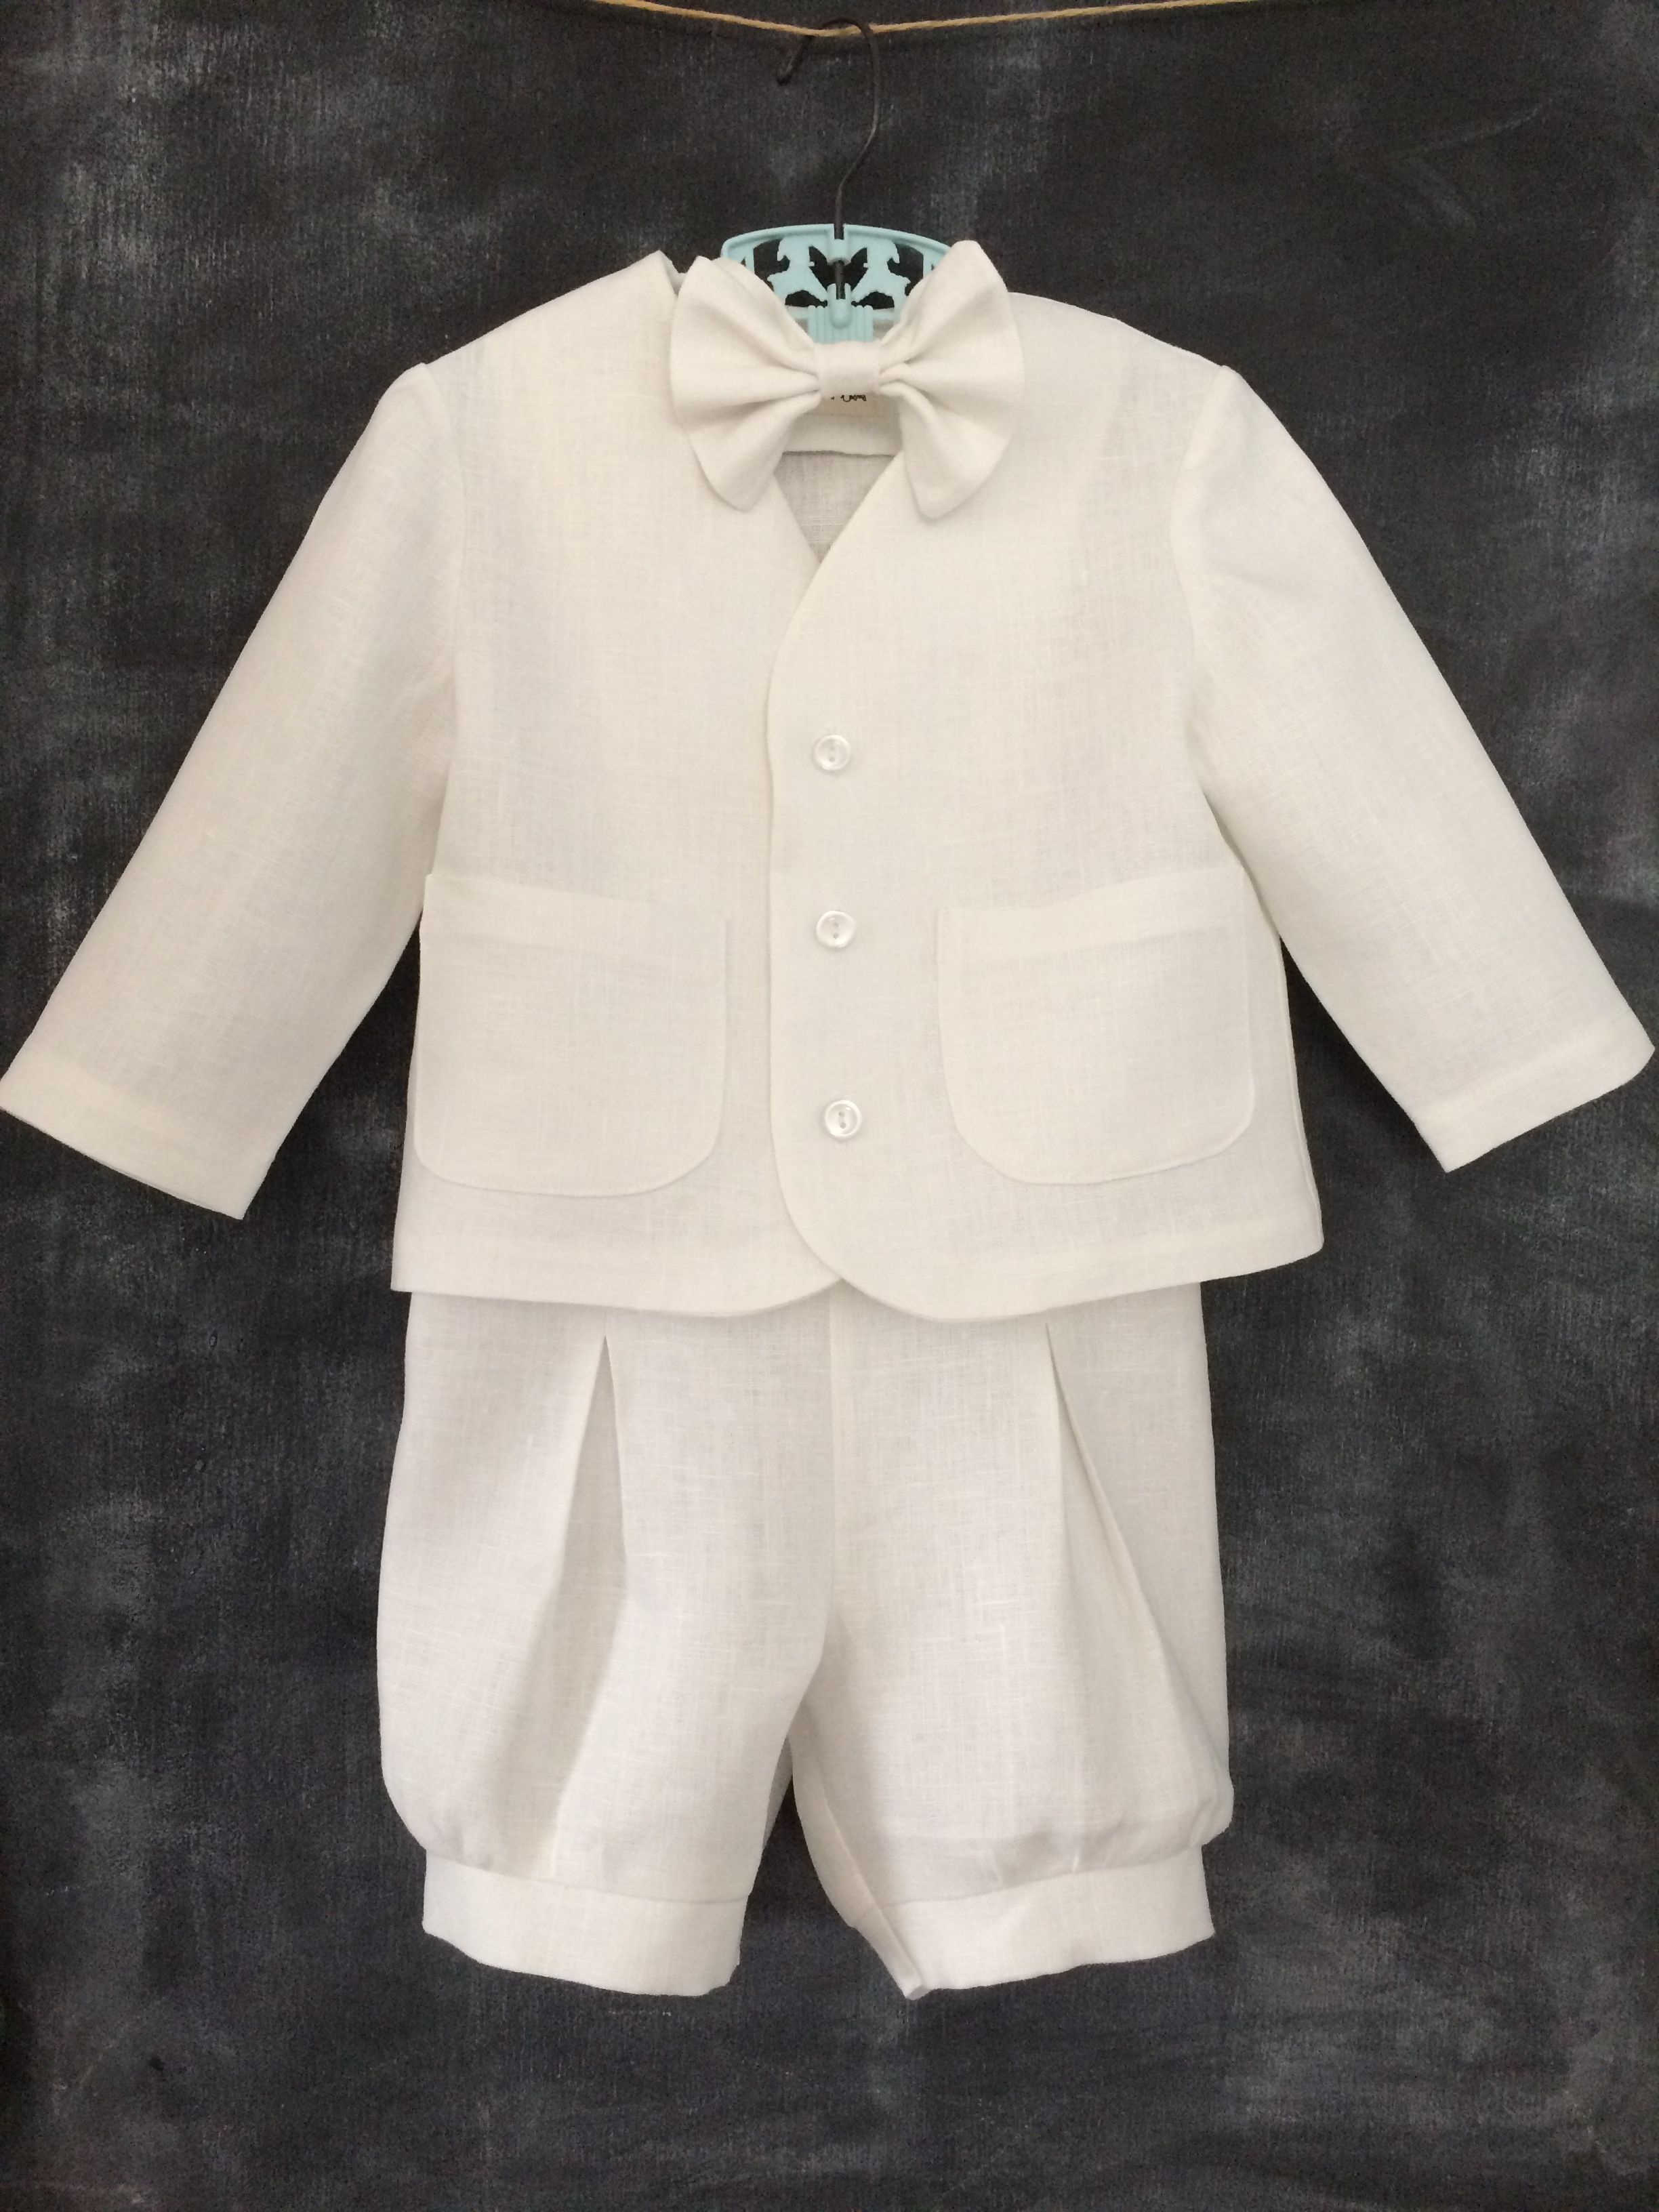 6e241d365 Baby/Toddler White Linen Baptism Outfit - babysuzannajohanna/etsy ...